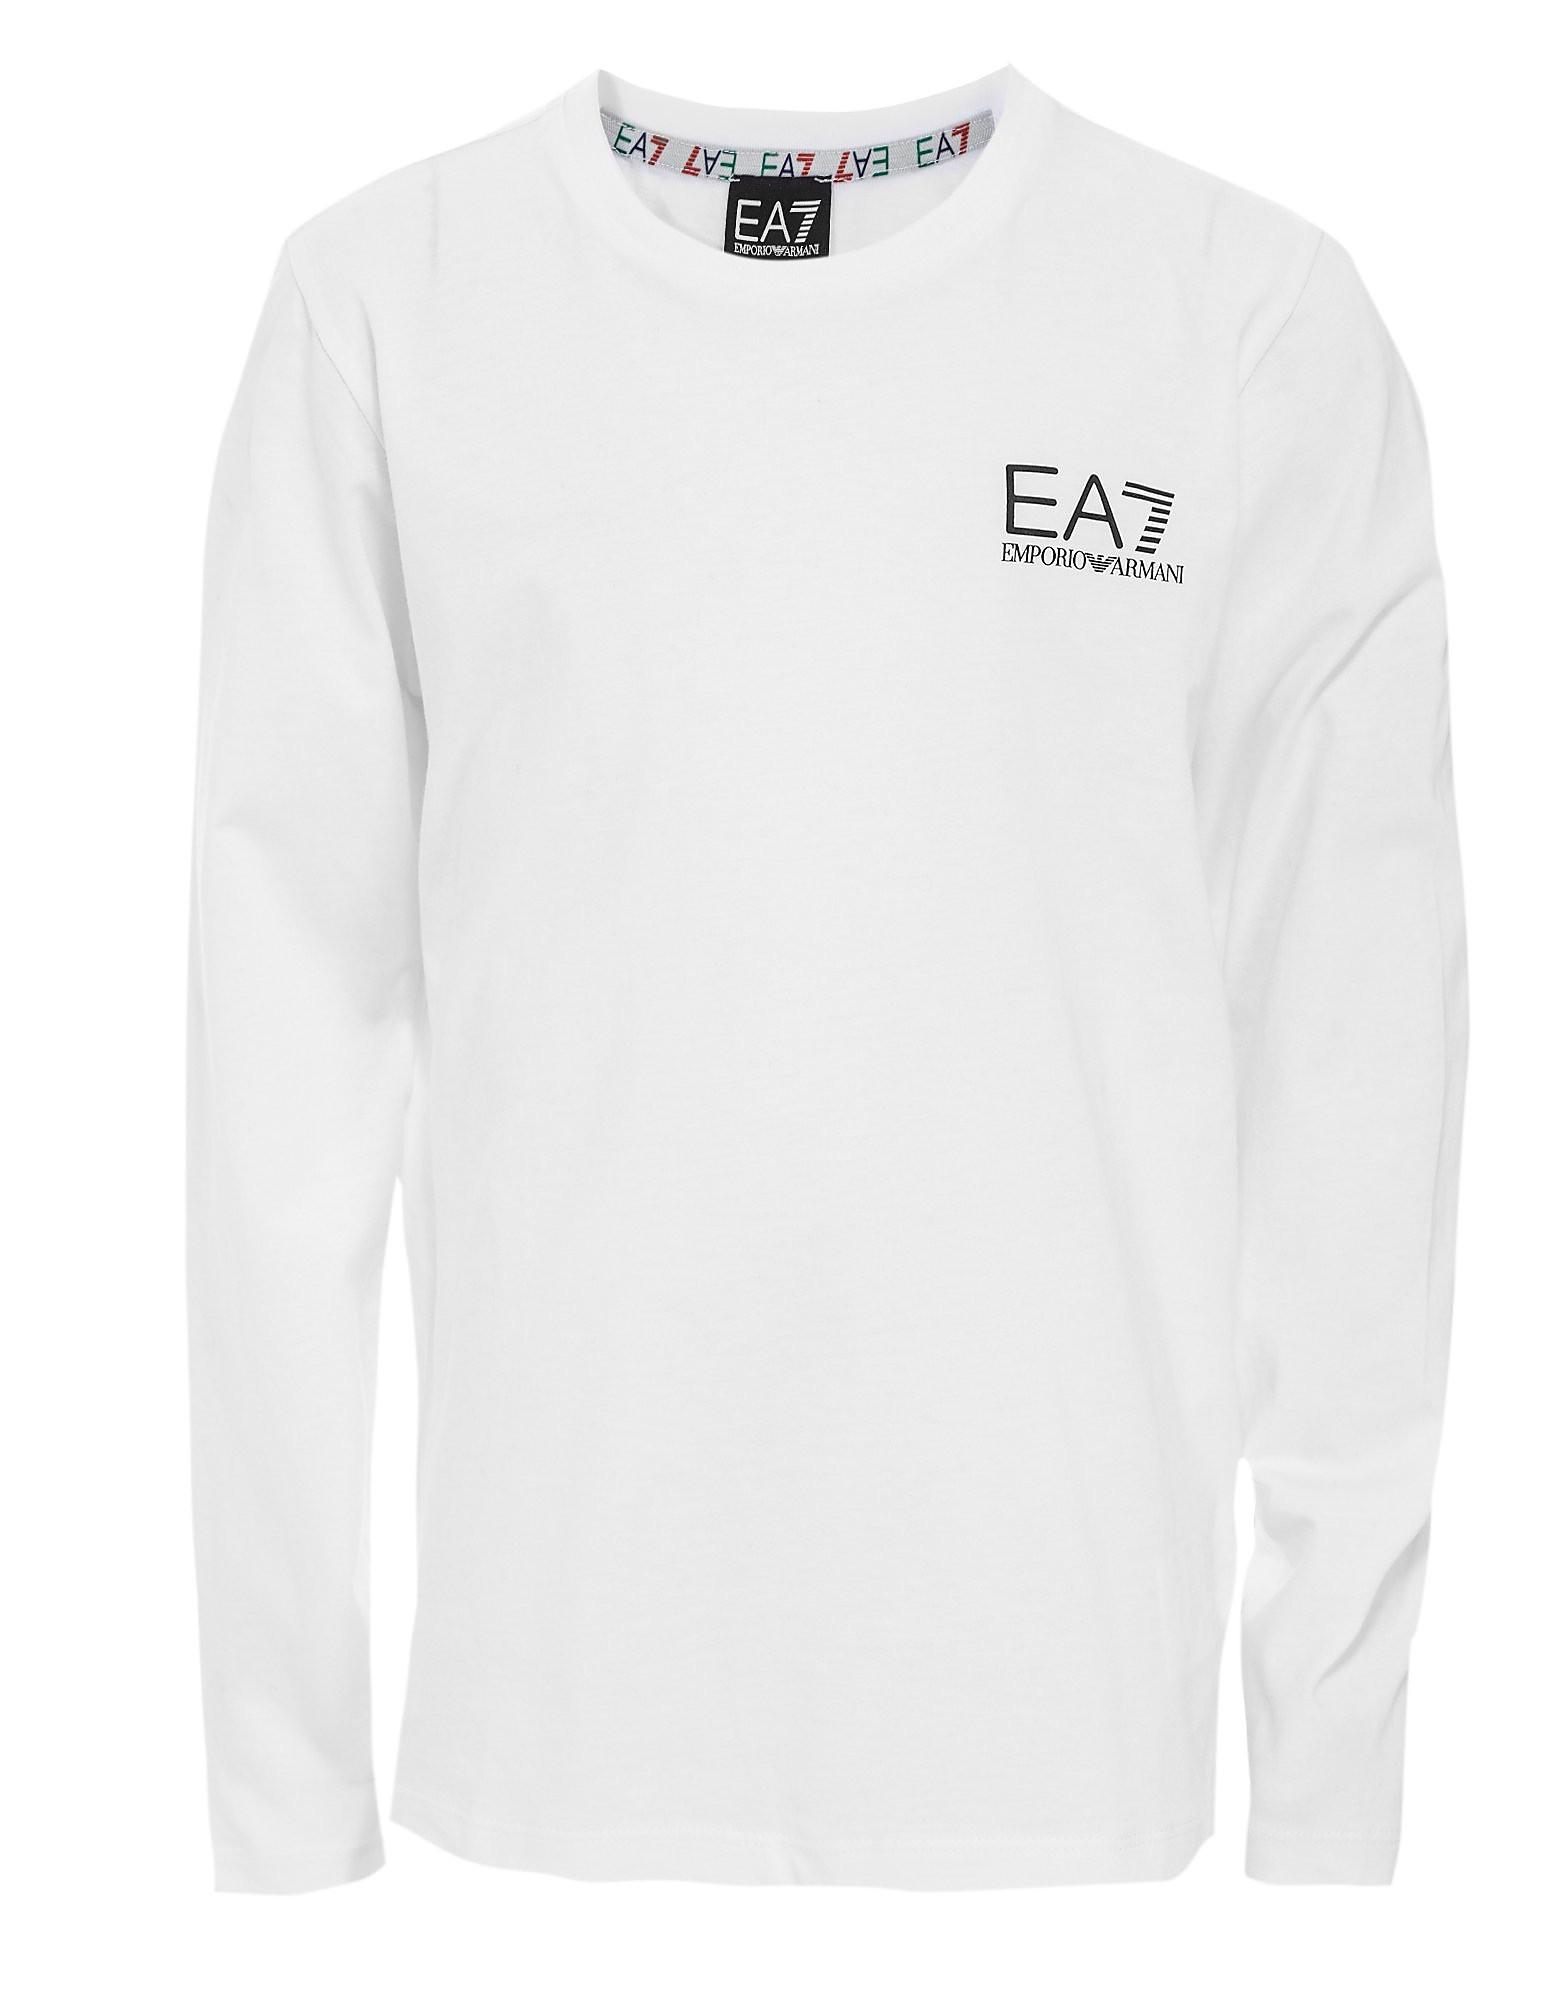 Emporio Armani EA7 Core Long Sleeve T-Shirt Junior